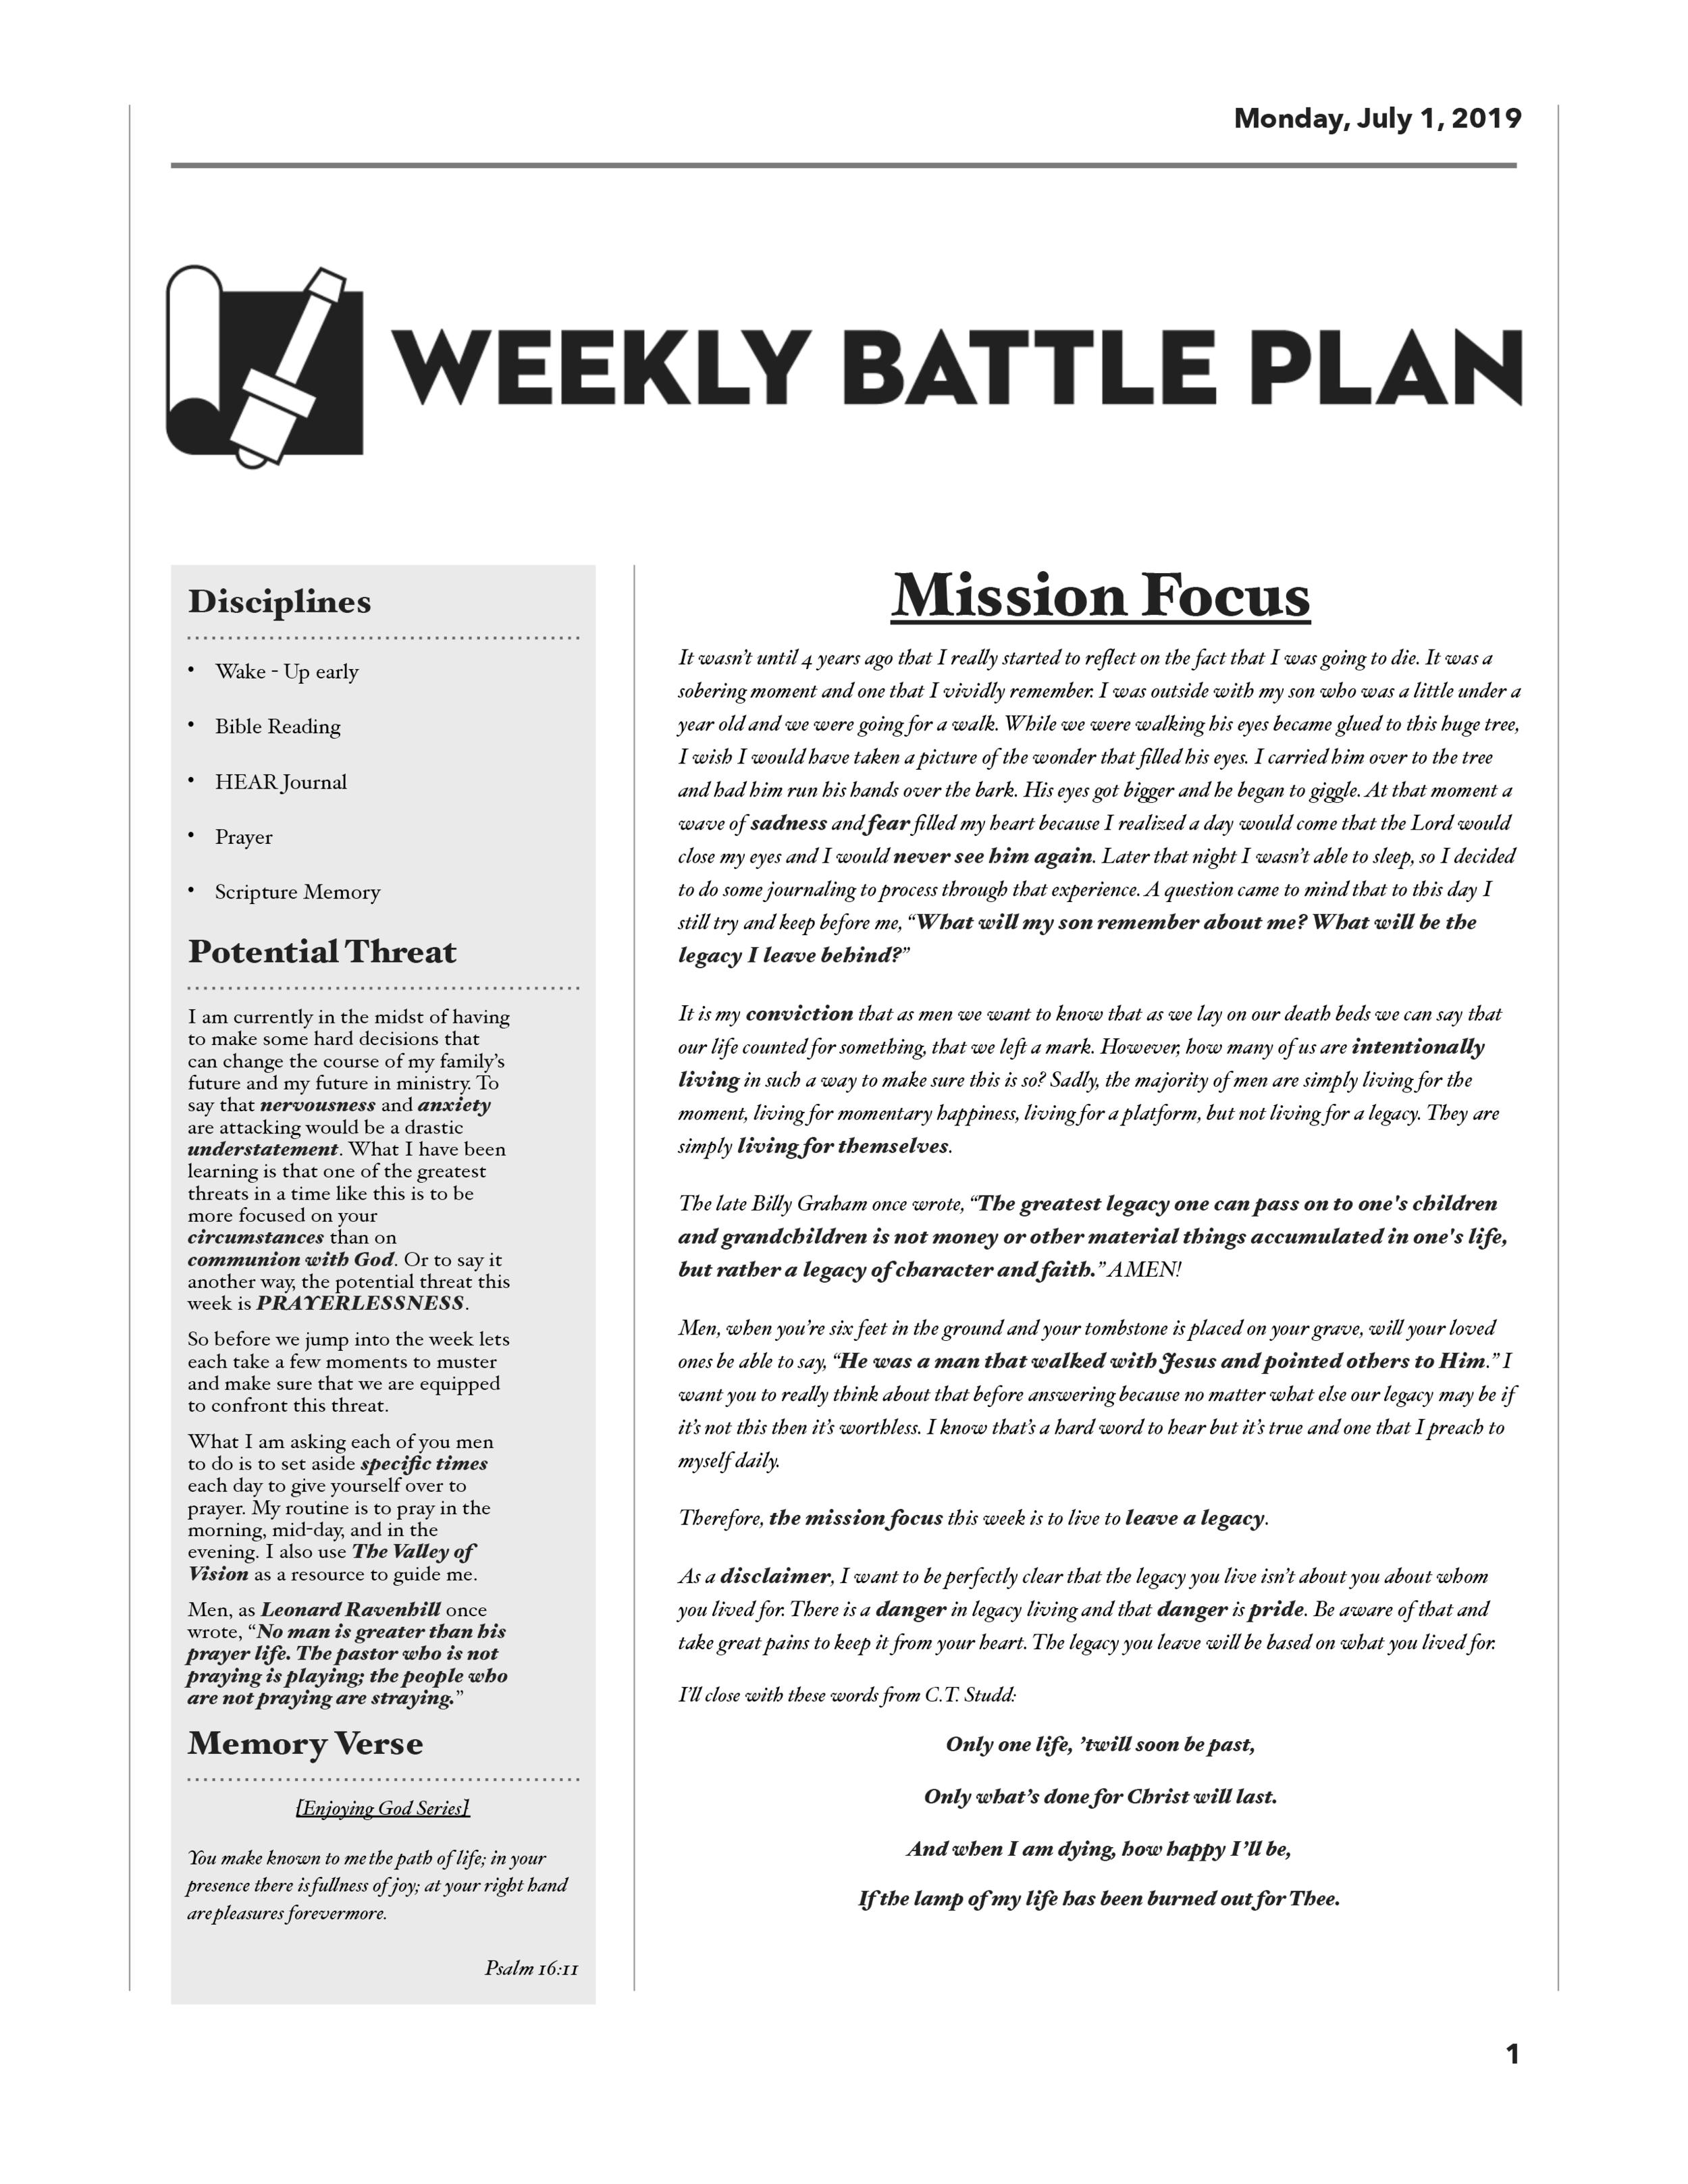 Battle Plan 7.1-1.png